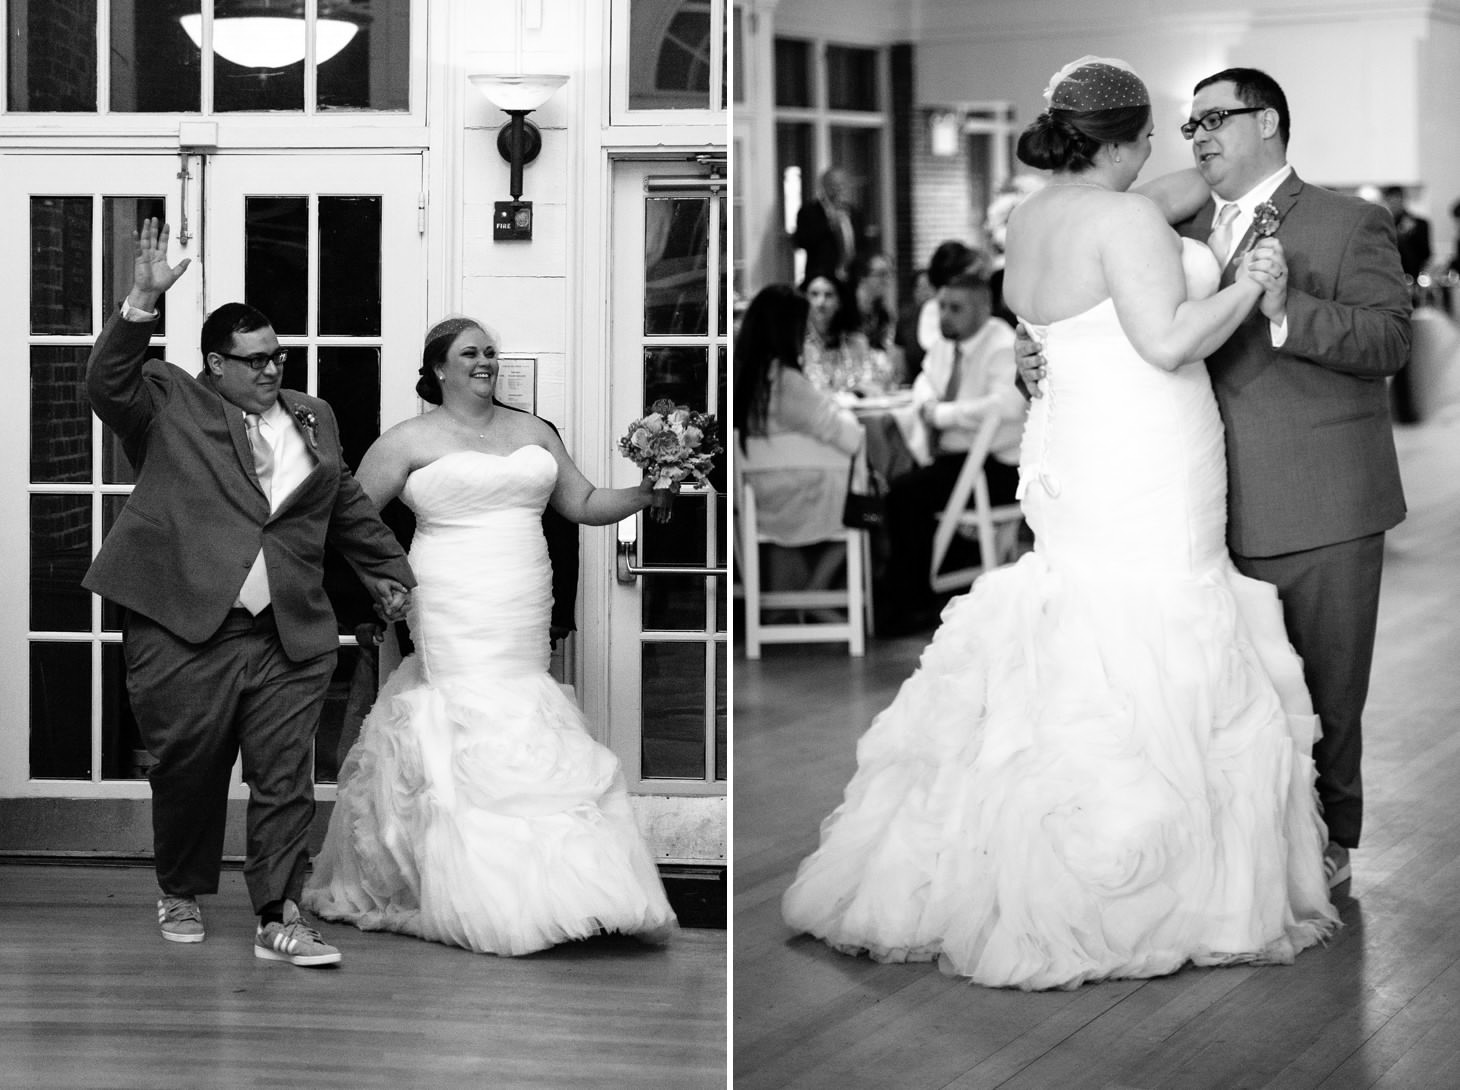 nyc-brooklyn-prospect-park-picnic-house-wedding-smitten-chickens-nerdy-43.jpg